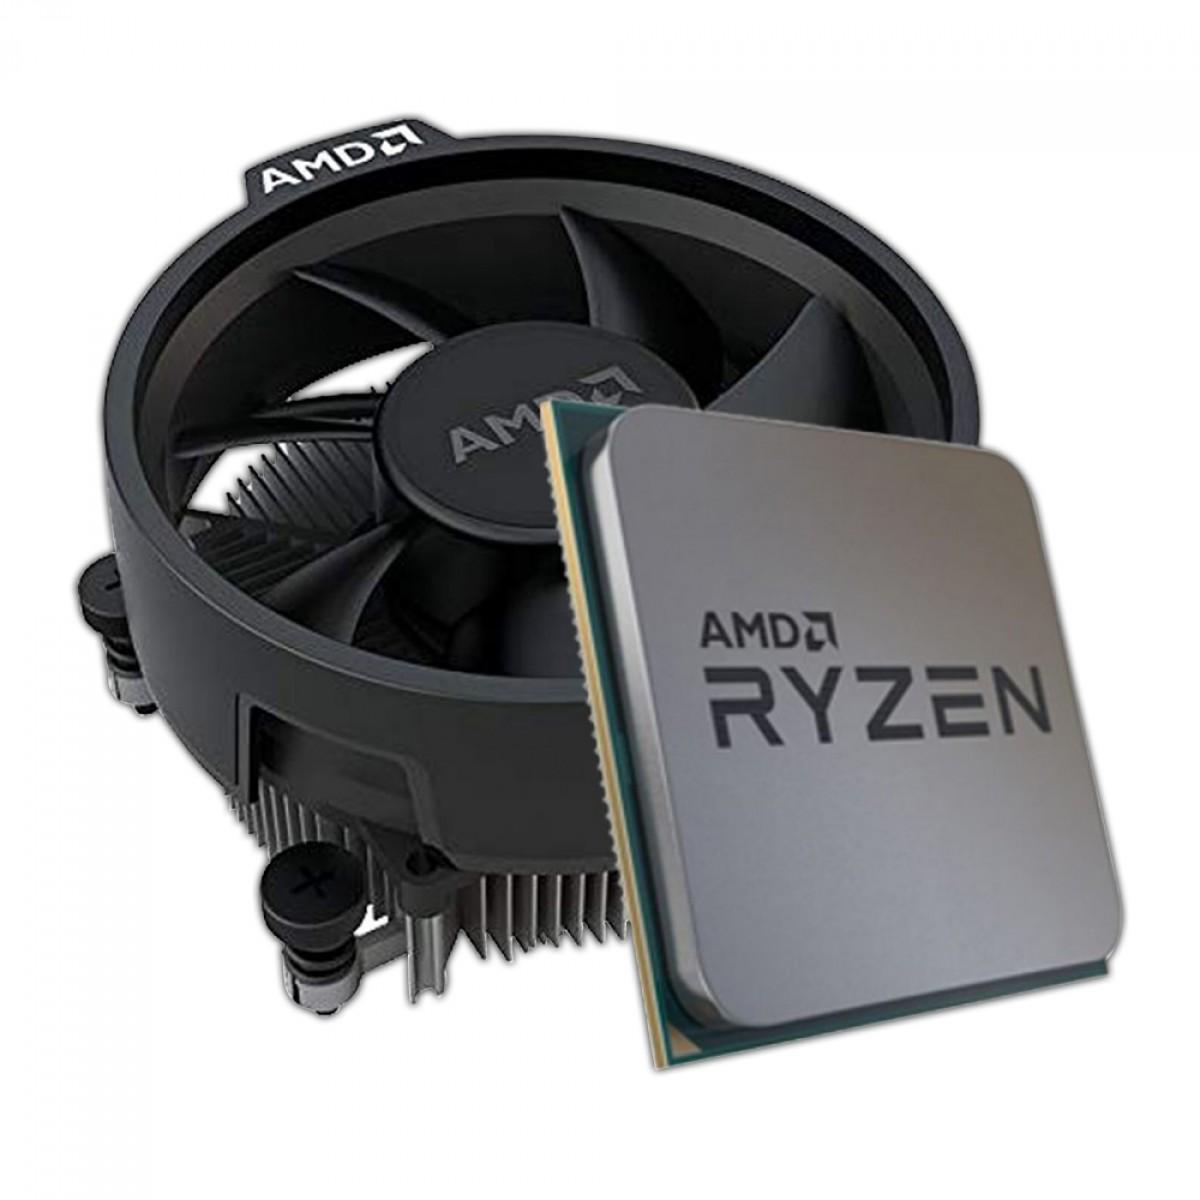 Kit Upgrade Placa Mãe ASRock B450M Steel Legend + Processador AMD Ryzen 5 3400G 3.7GHz (4.2GHz Turbo)